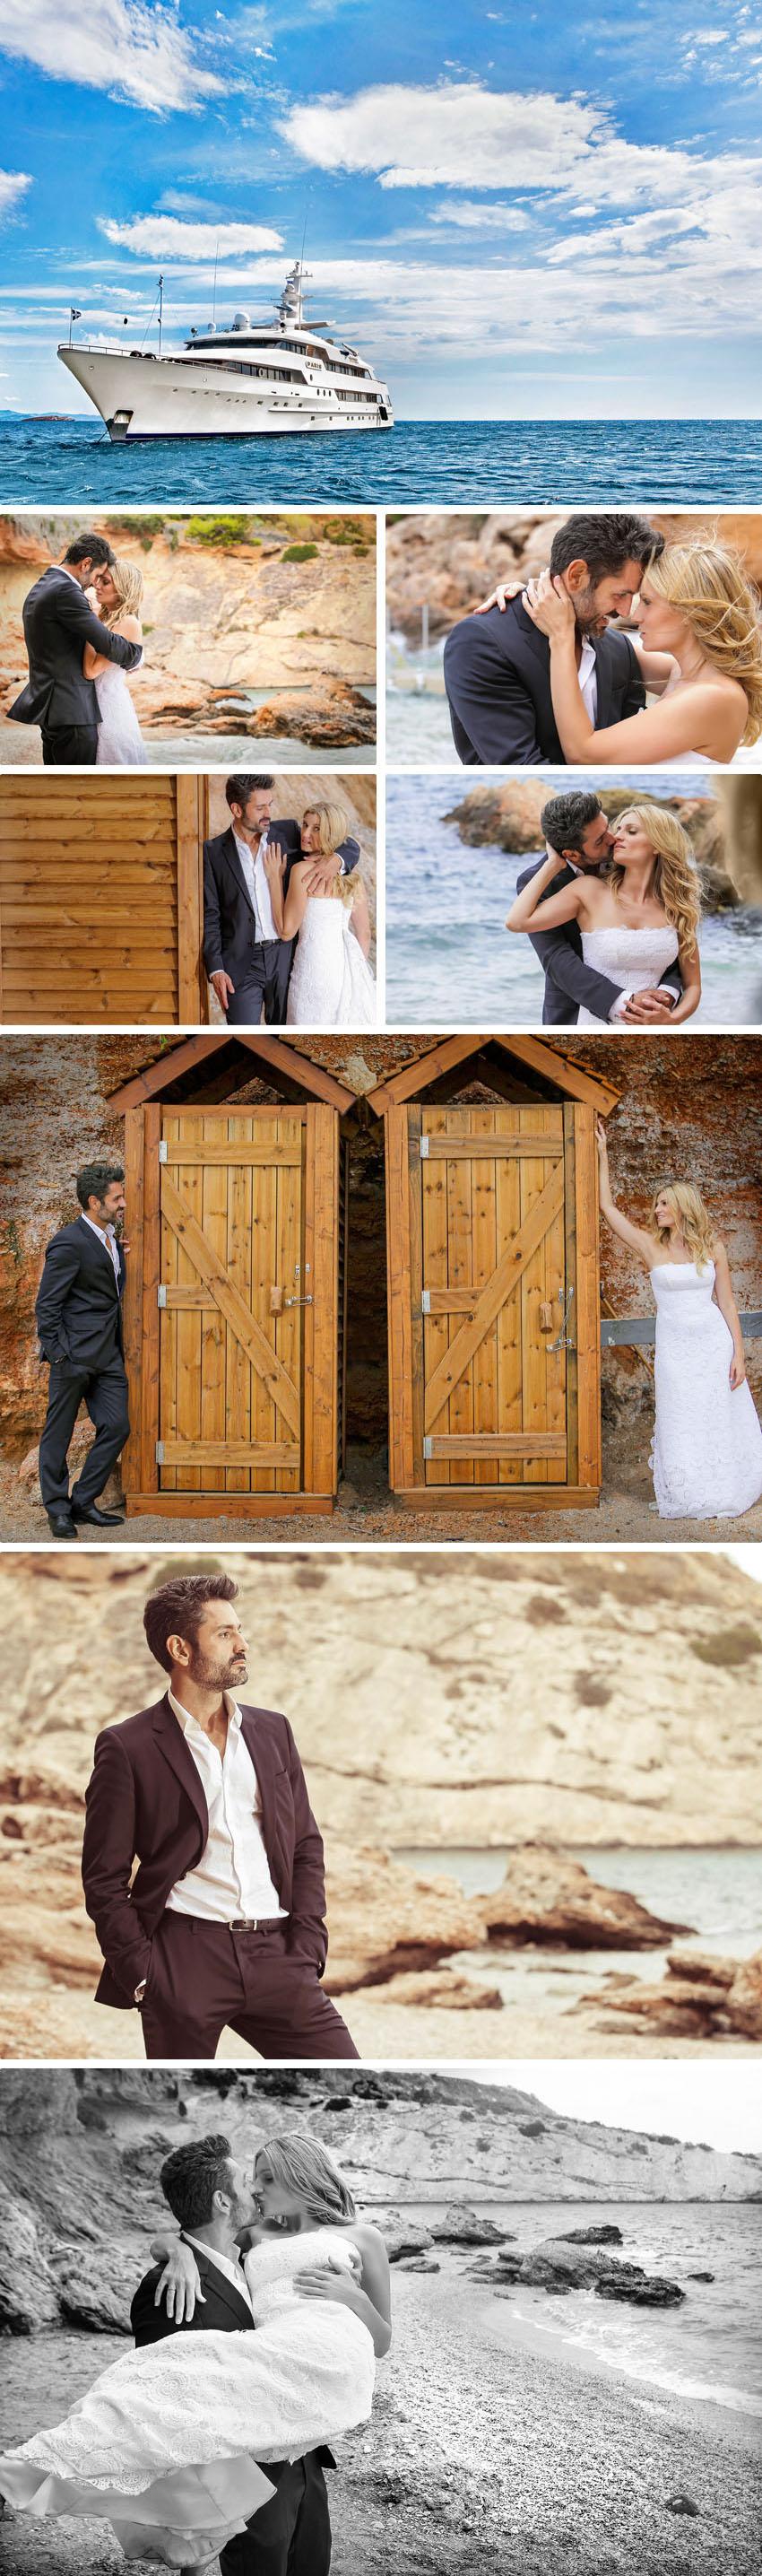 35_Destination wedding photography